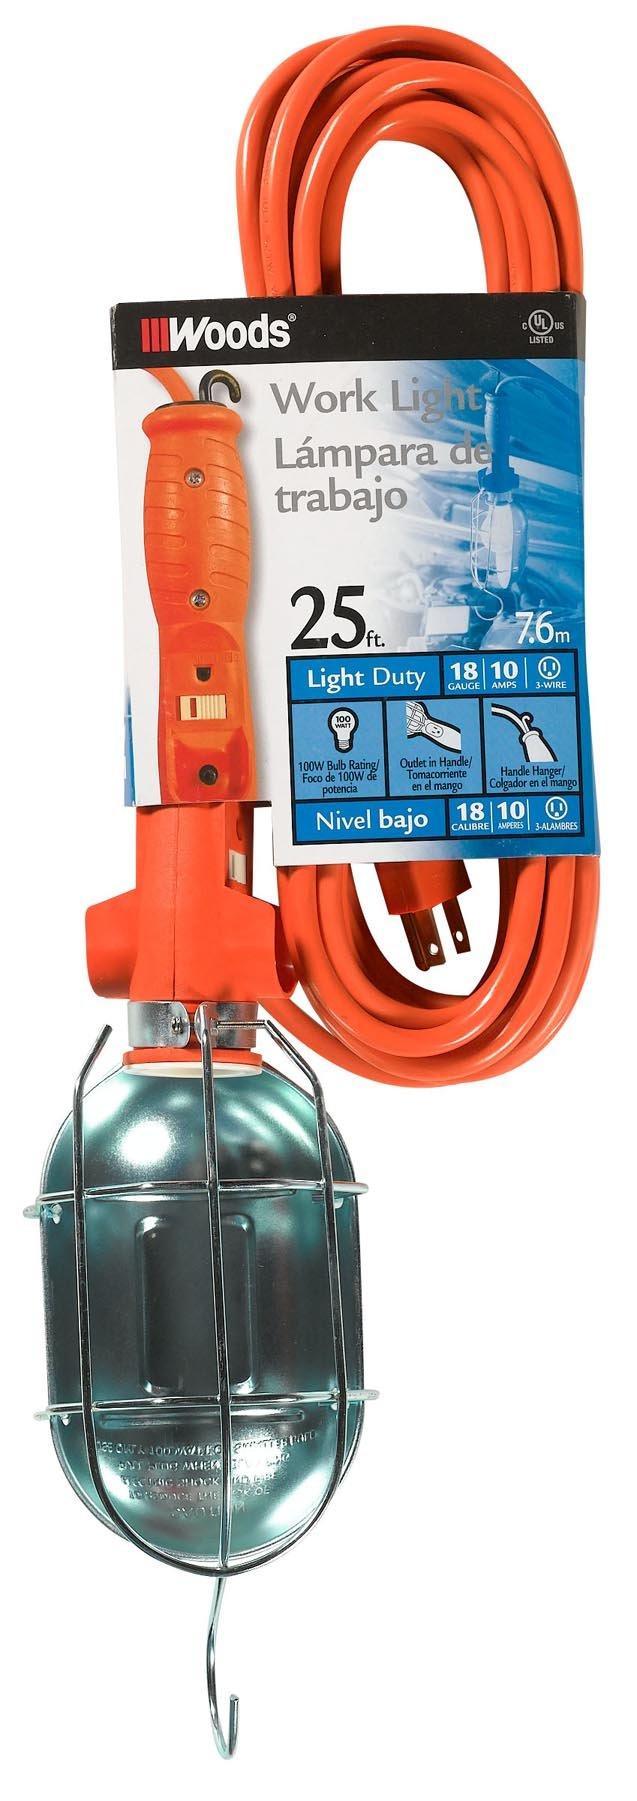 Woods 0681 18/3-Gauge SJTW Trouble Light with Metal Guard & Outlet, 75-Watt, 25-Foot, Orange